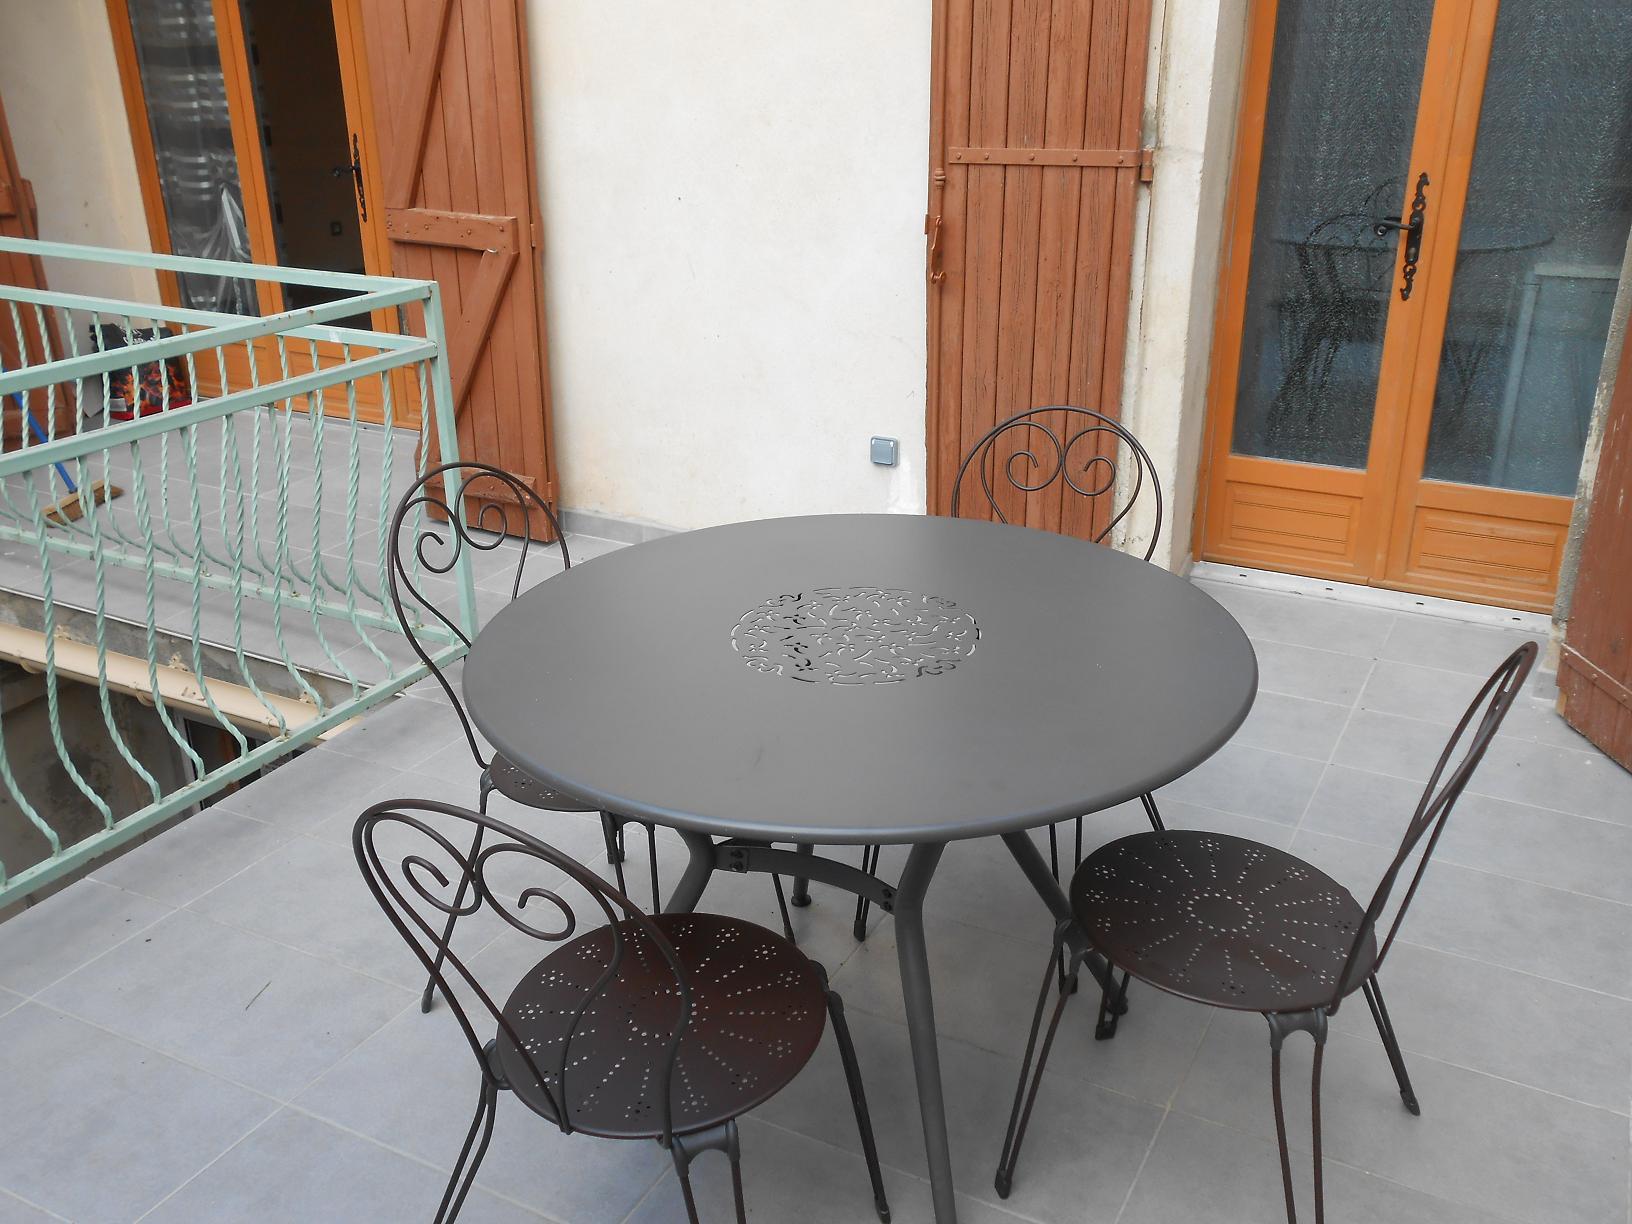 terrasse-appart-meuble-tarascon-beaucaire-la-maison-olivier